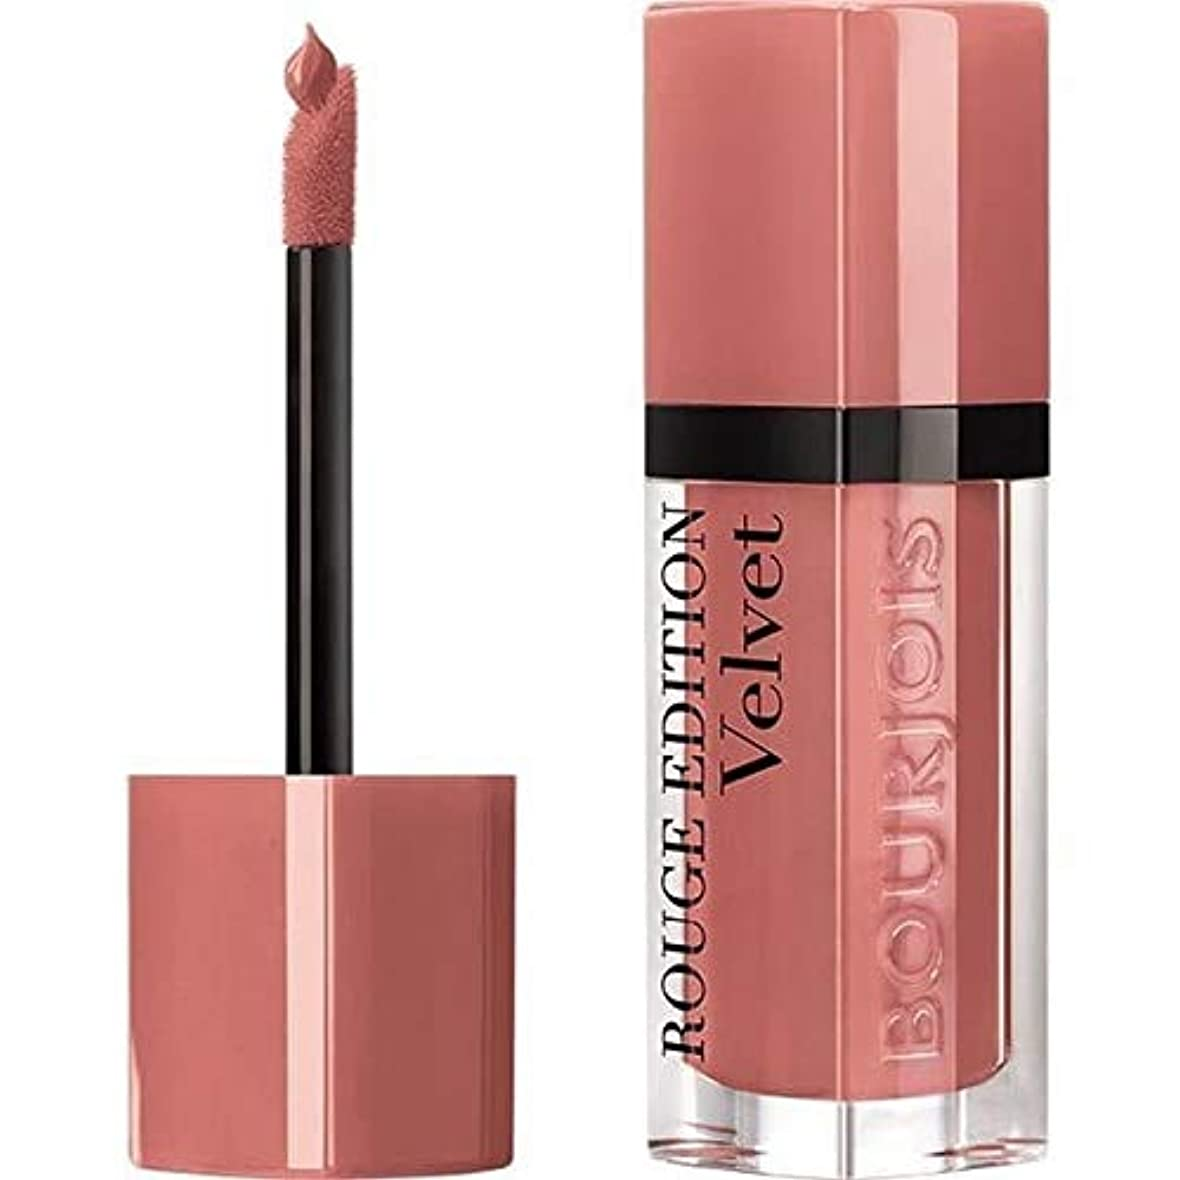 [Bourjois ] ブルジョワ液体口紅ルージュ版のベルベットのChocopink 28 - Bourjois Liquid Lipstick Rouge Edition Velvet Chocopink 28 [並行輸入品]